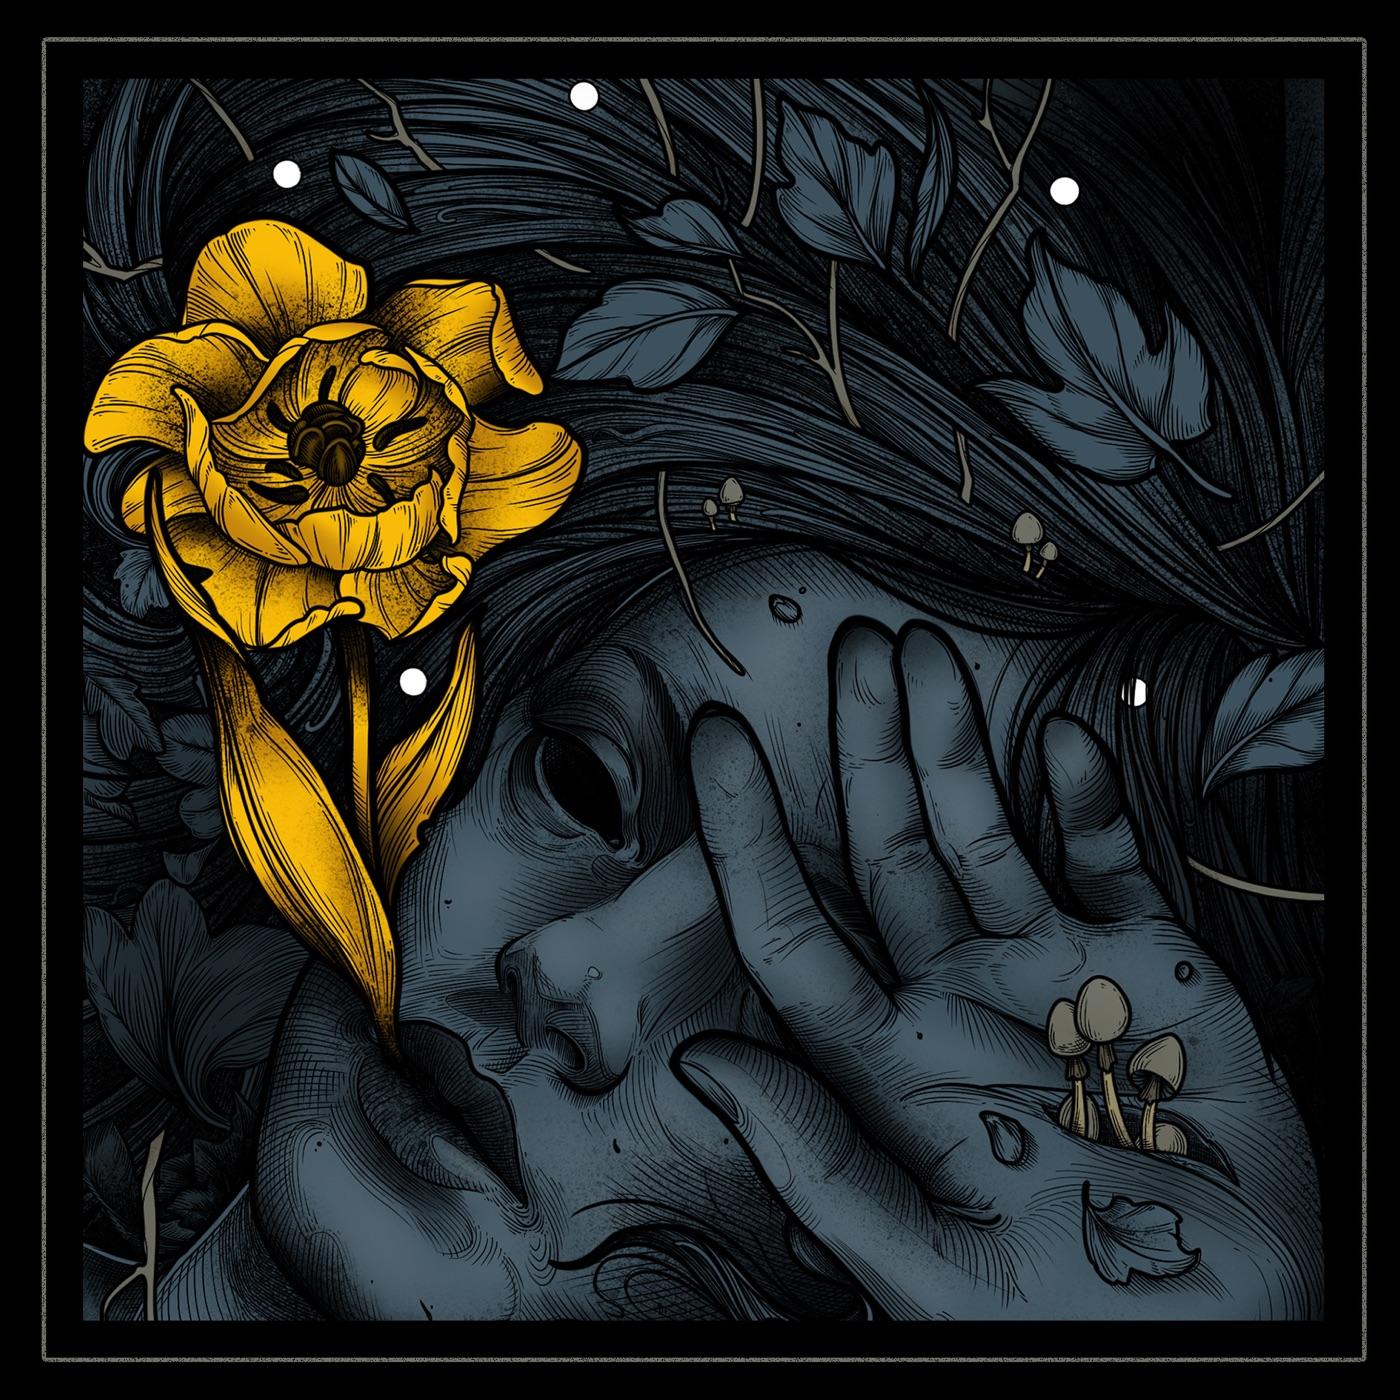 Neverland In Ashes - Aloha 'Oe [single] (2019)